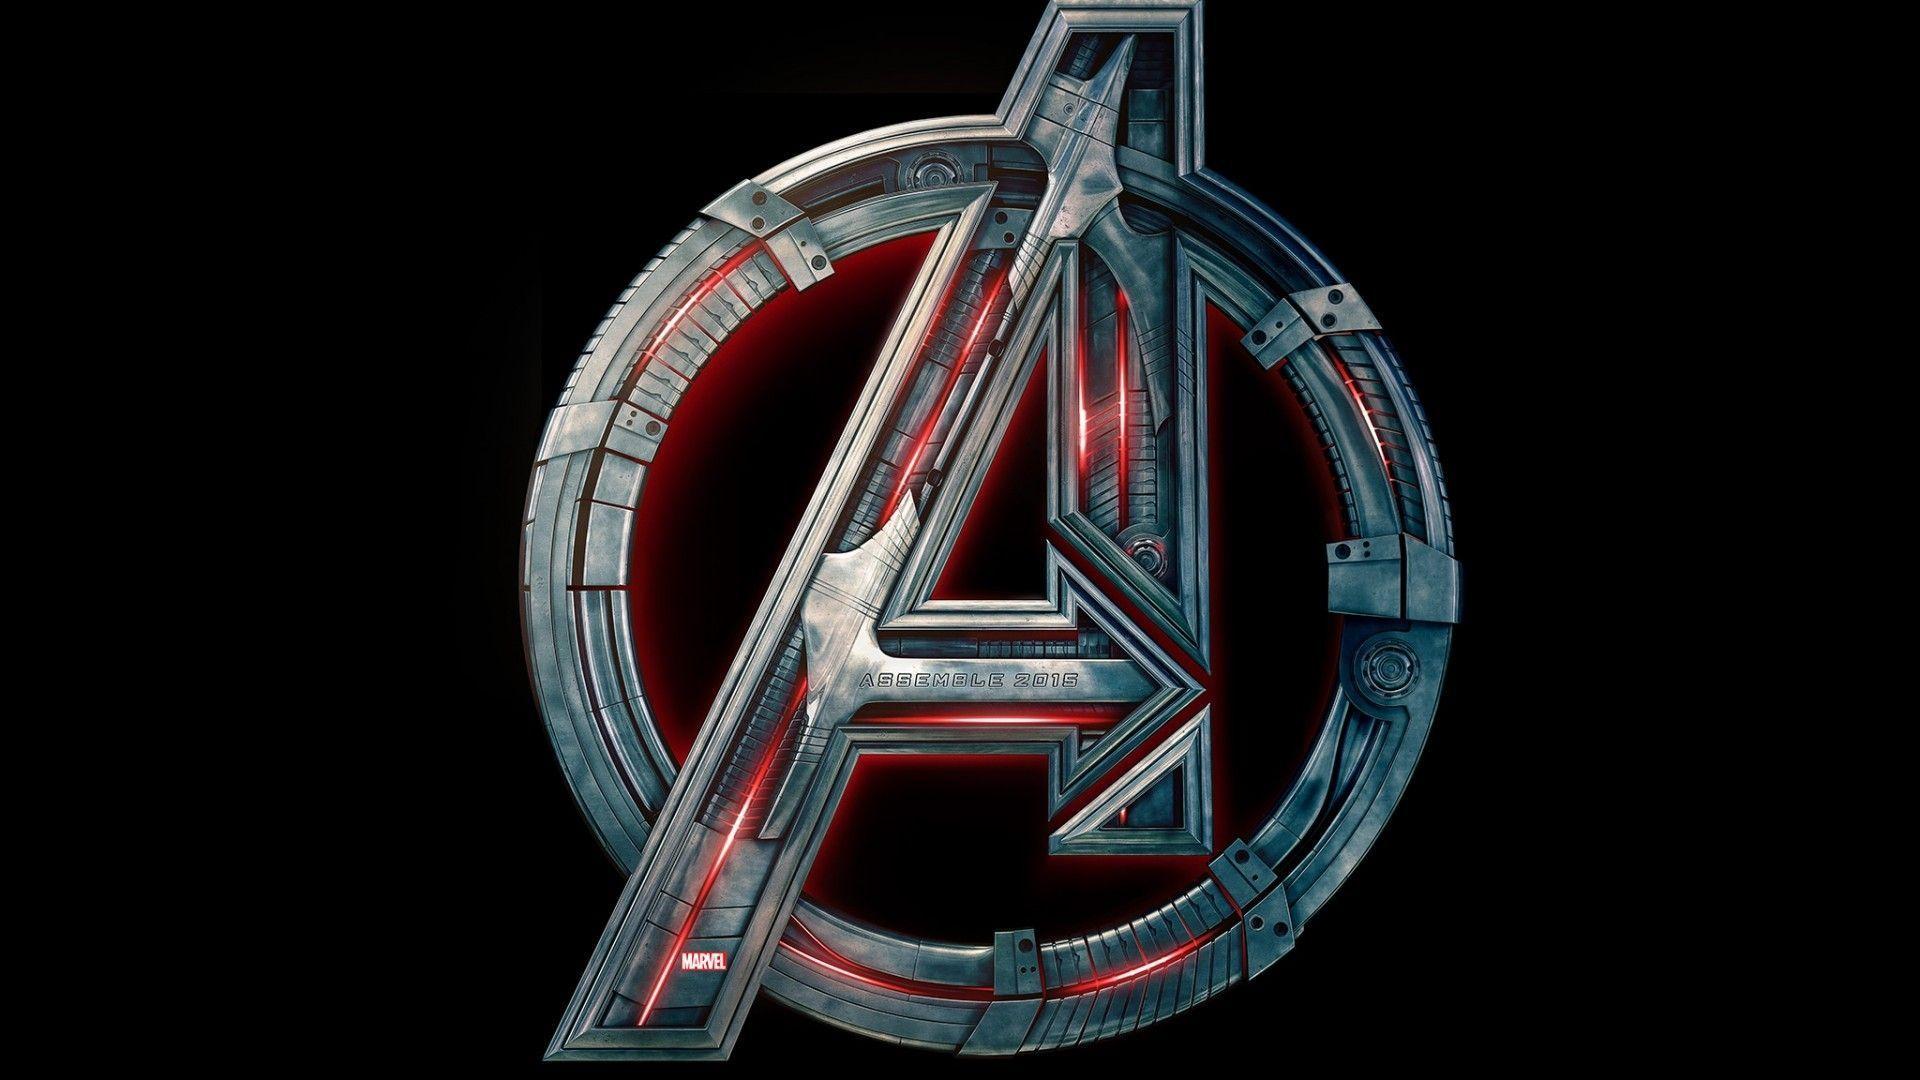 Avengers Logo Wallpapers Wallpaper Cave Avengers Wallpaper Avengers Symbols Marvel Wallpaper